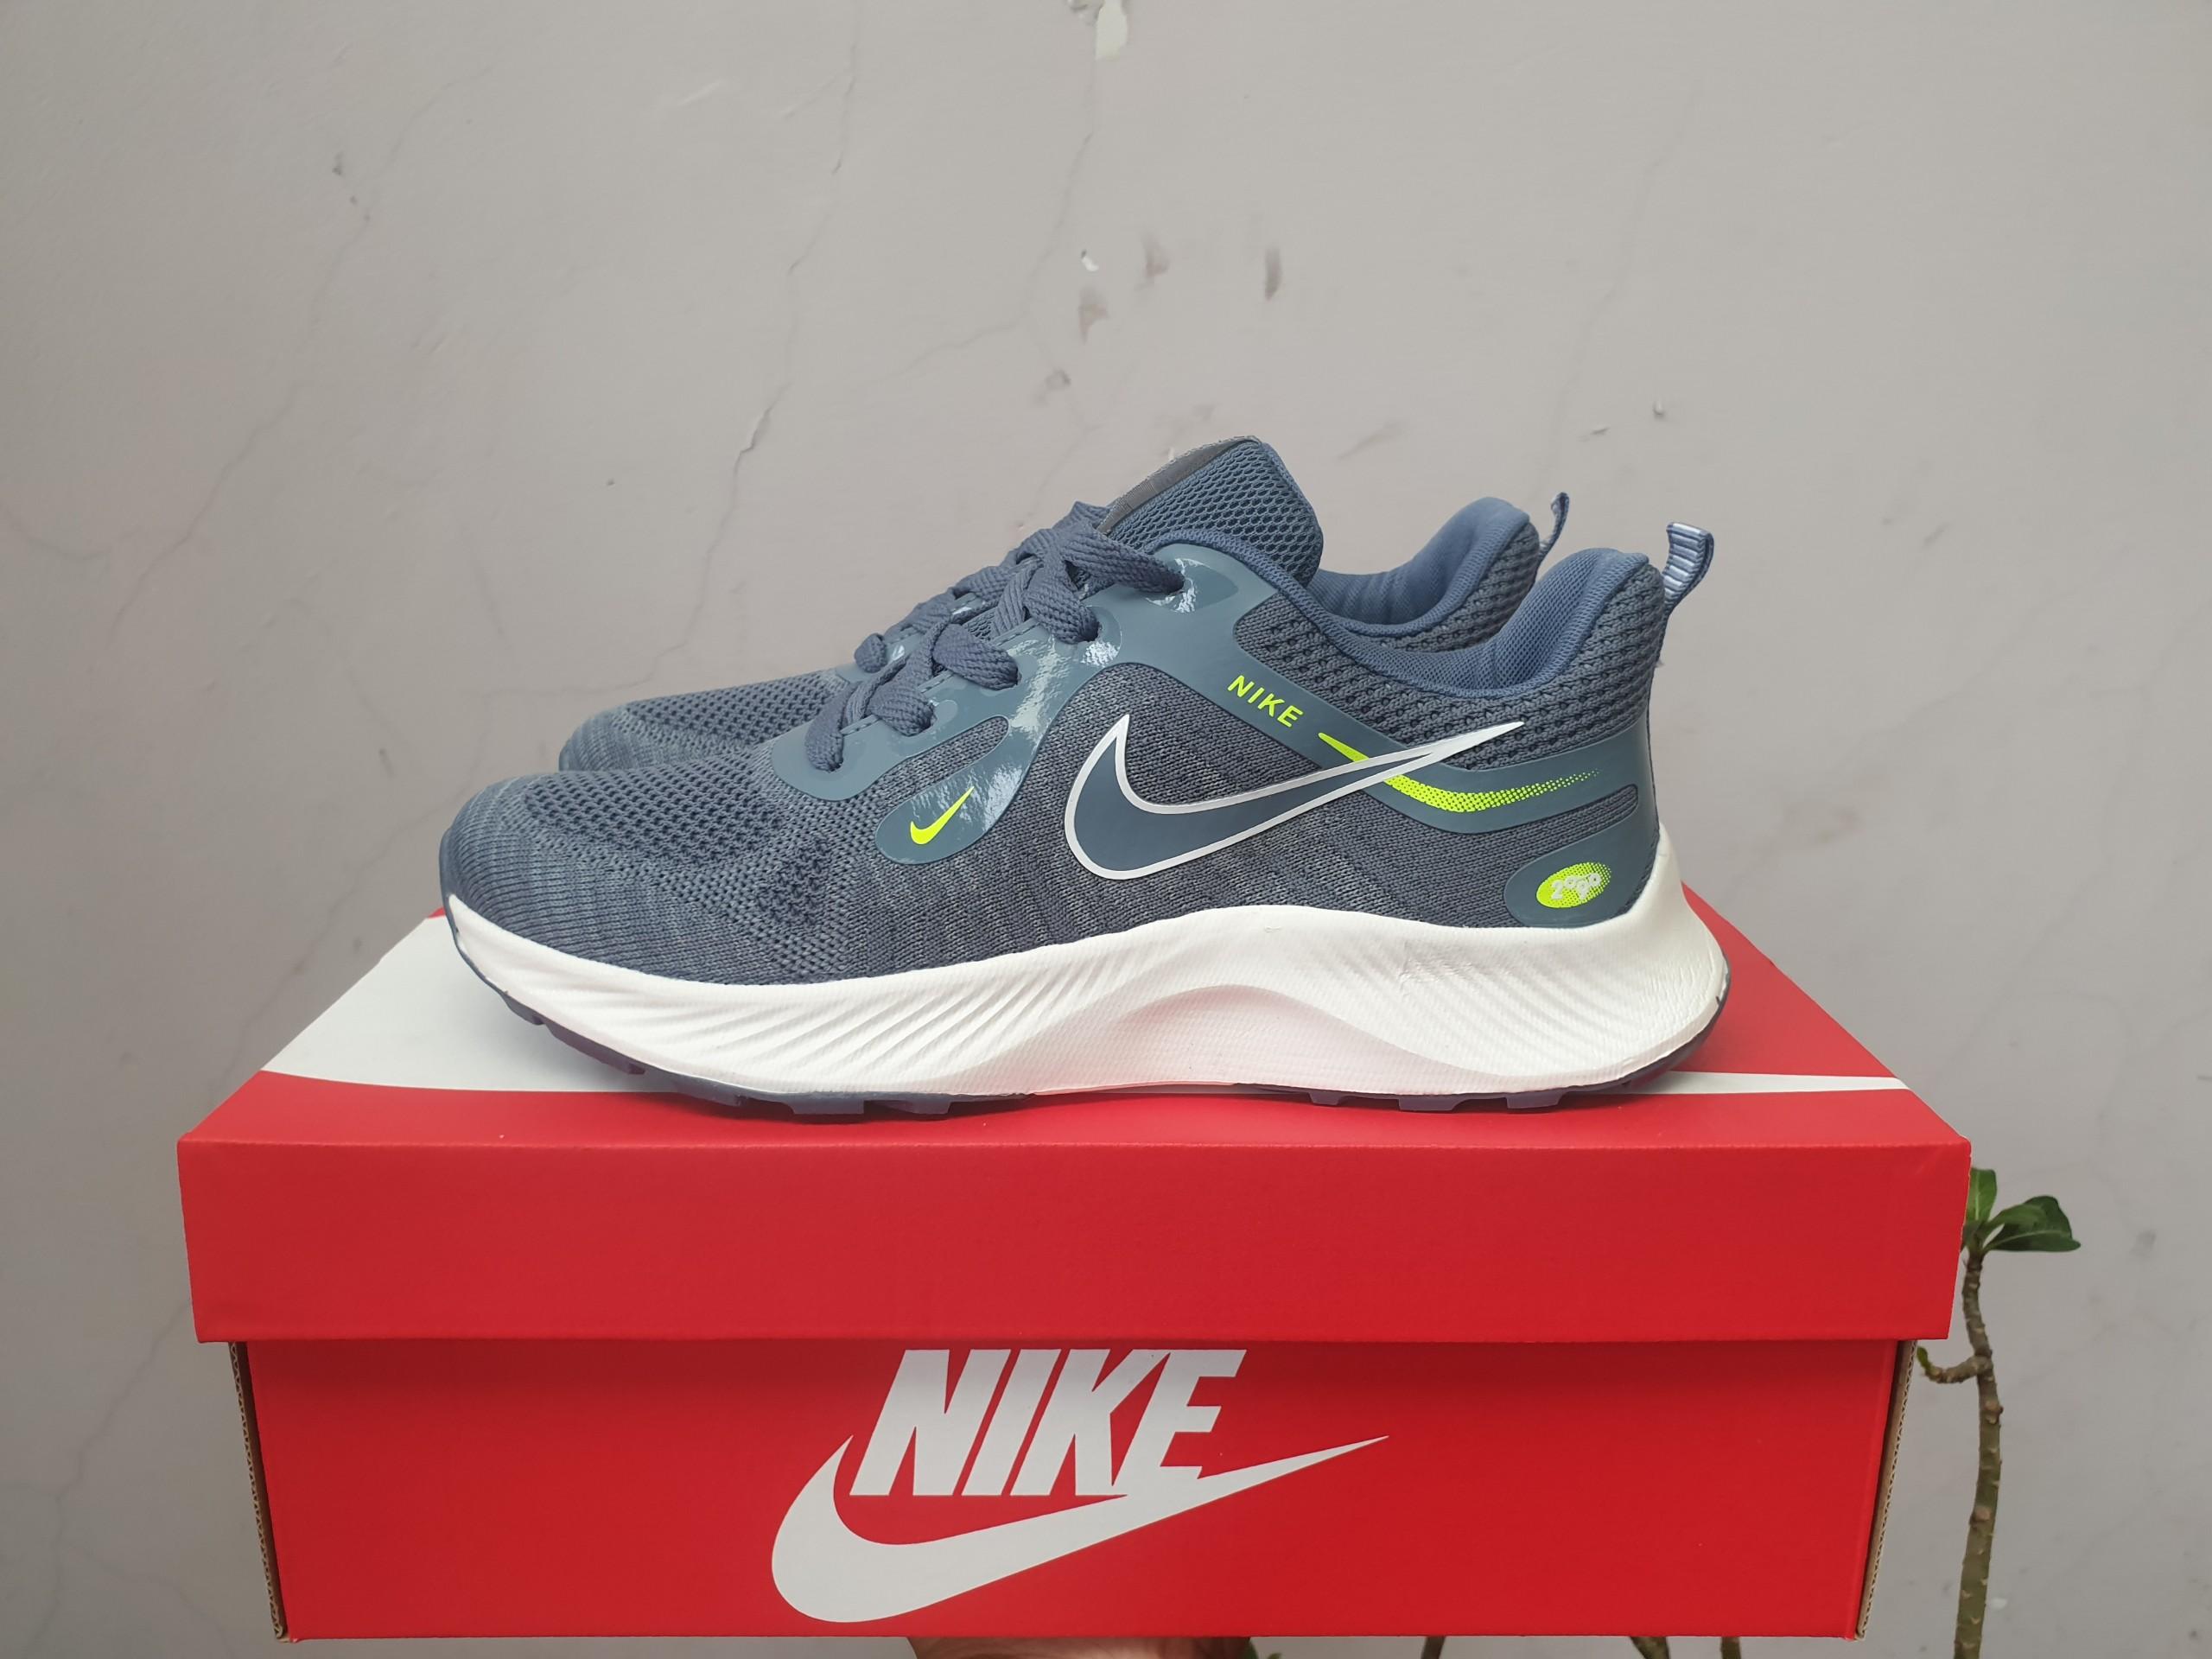 Giày Nike Zoom 03 xanh